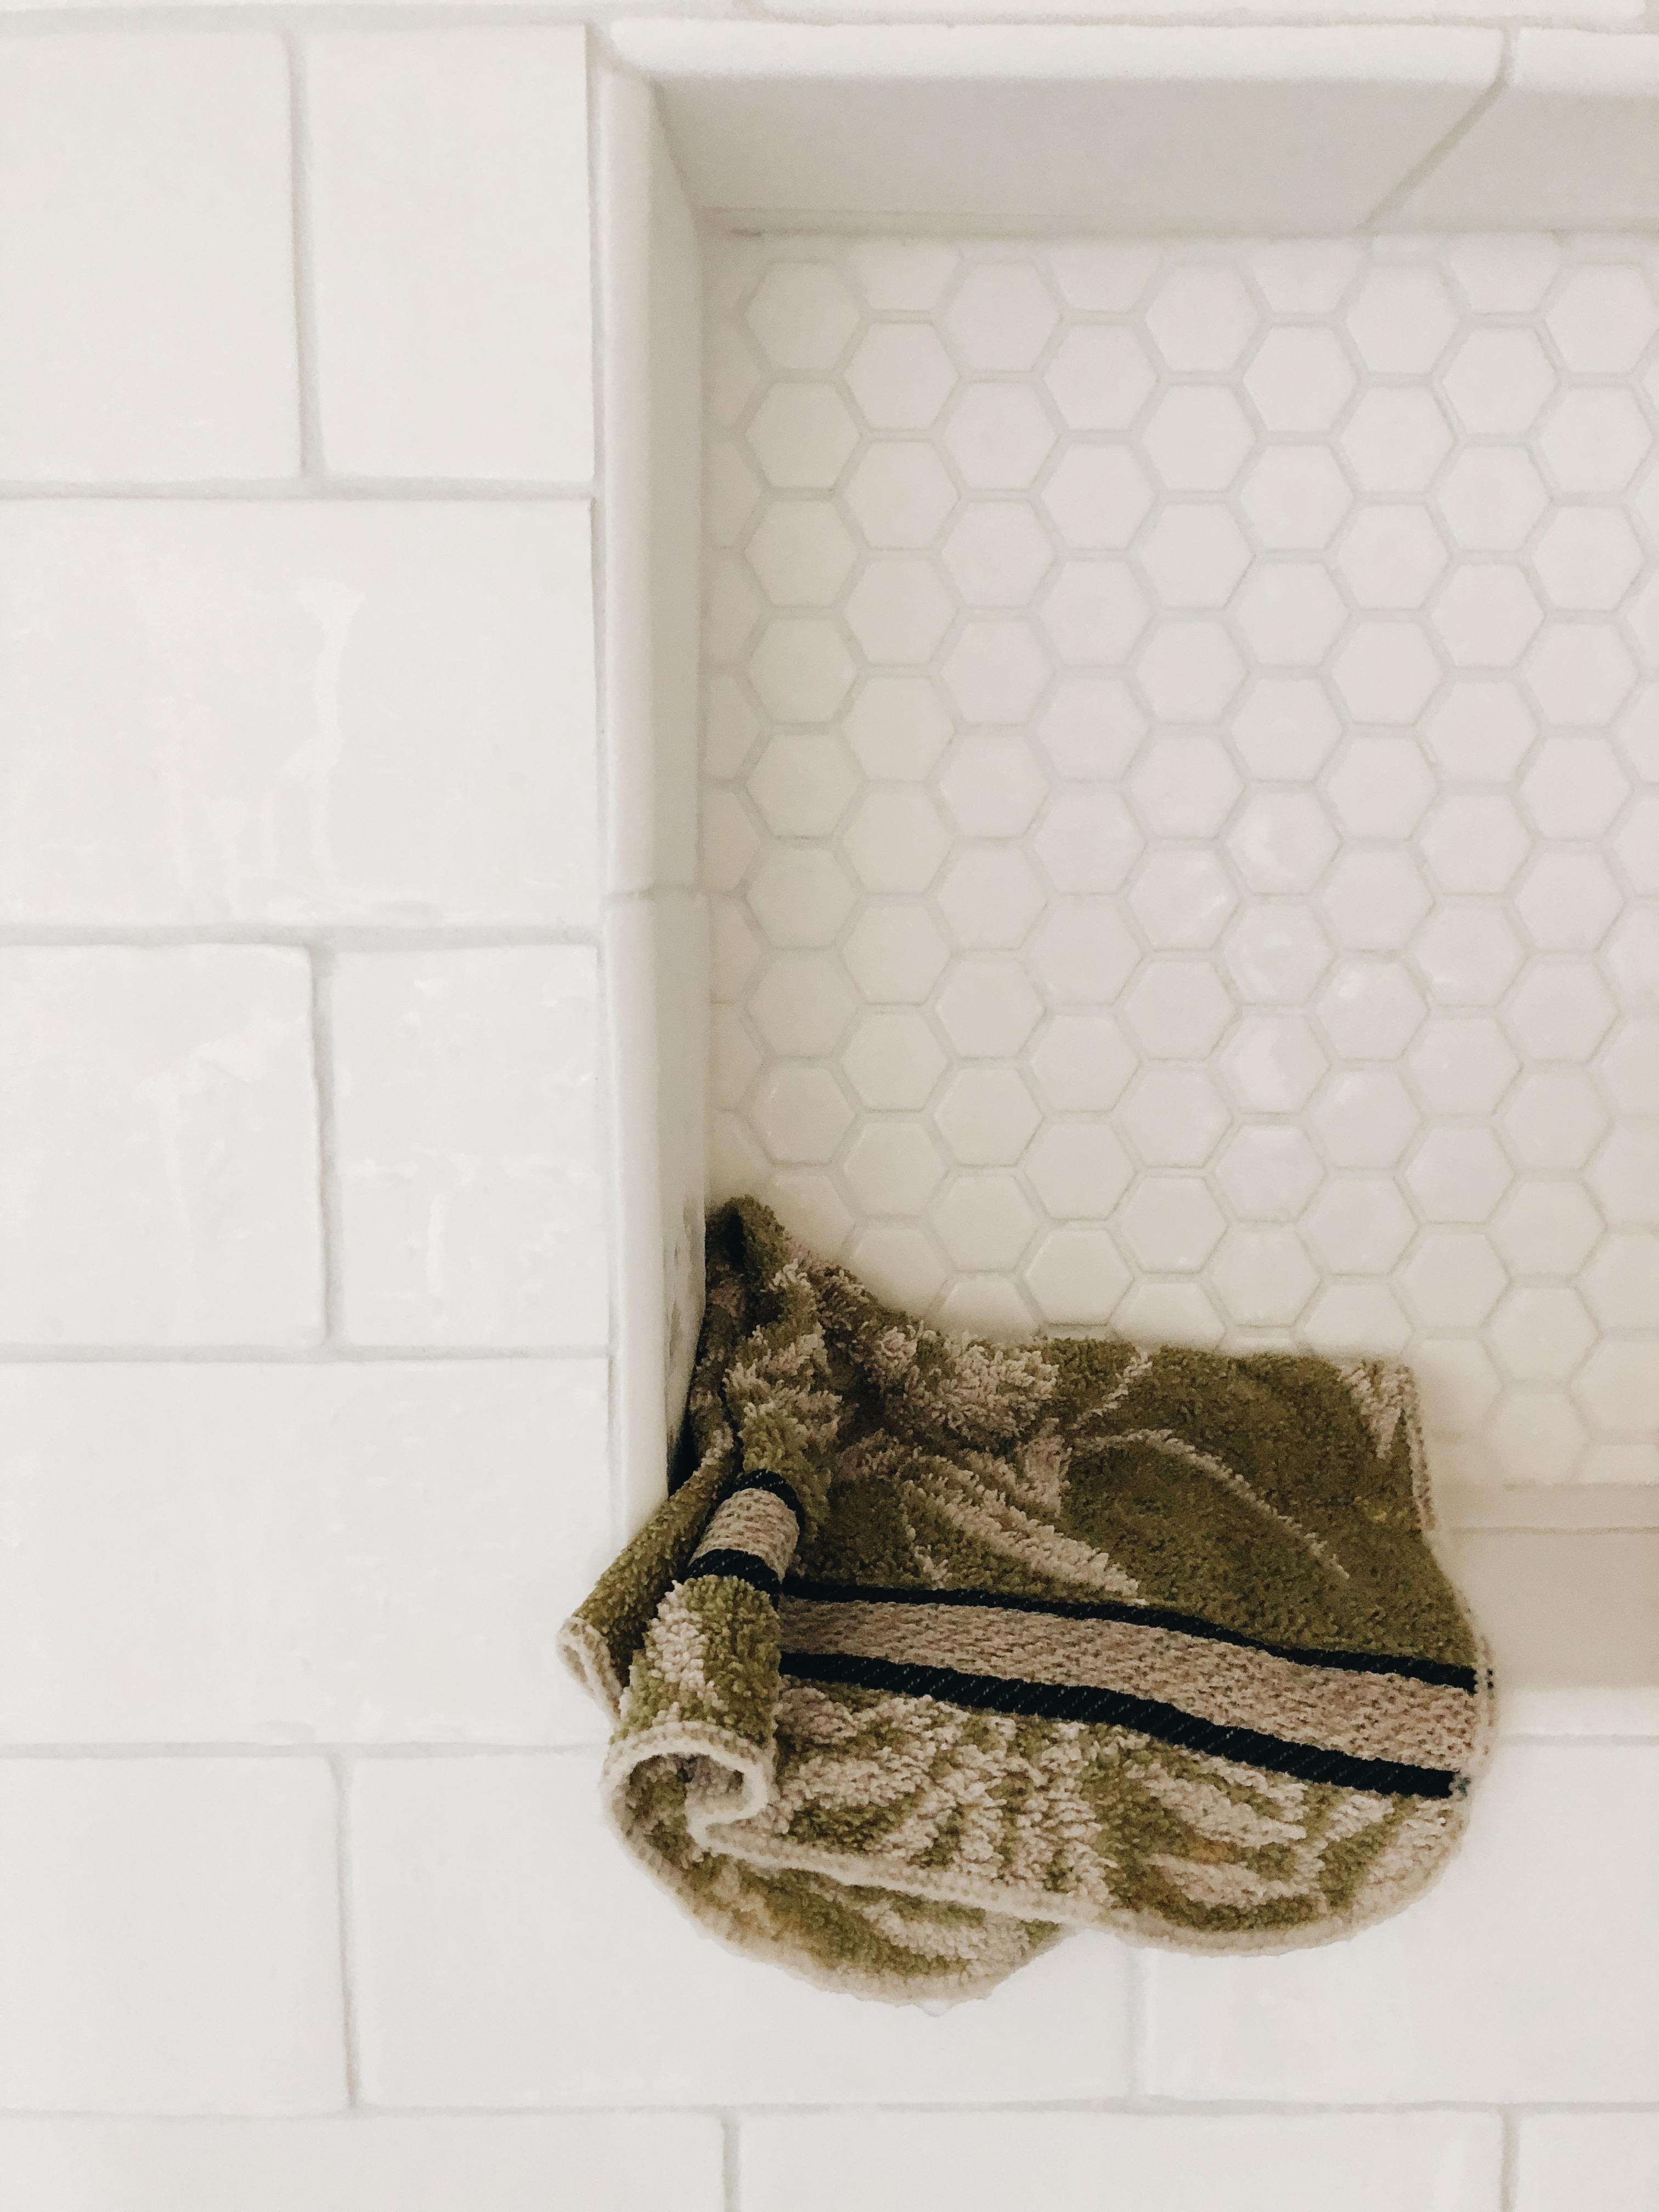 rag in shower